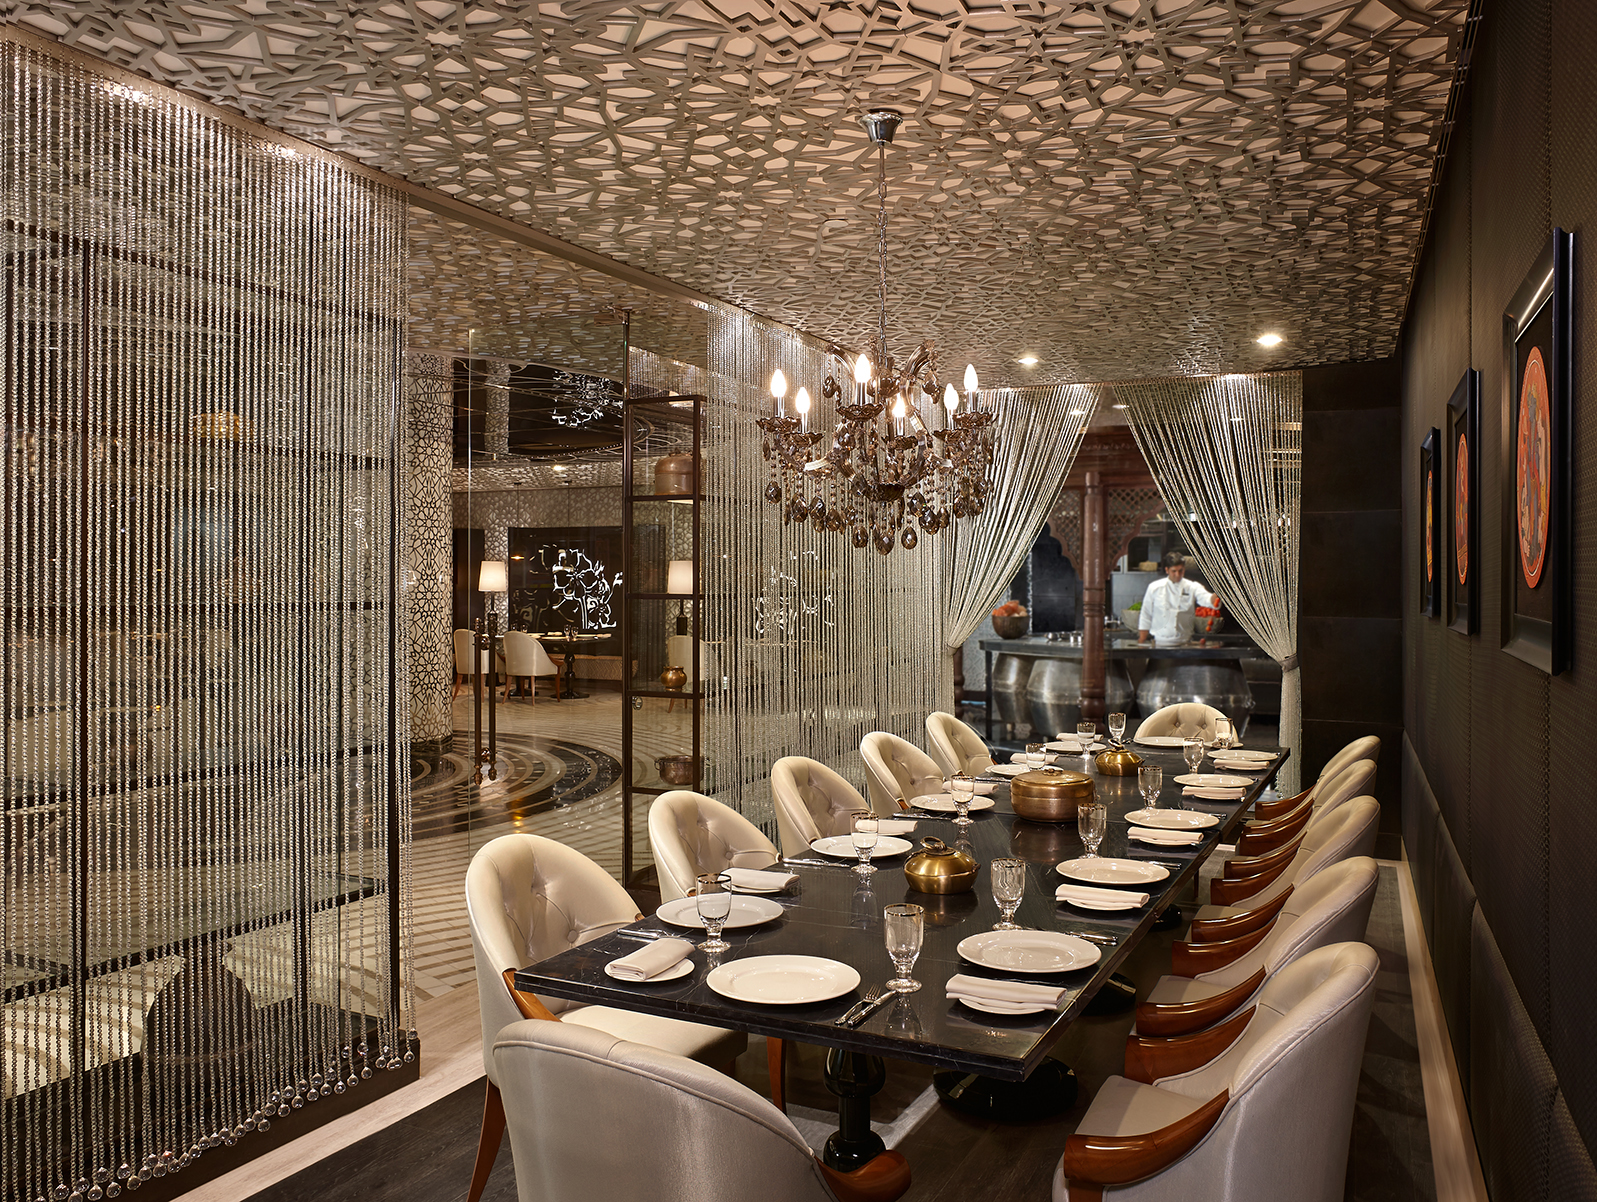 Lavana, the fine dining restaurant at the Hyatt Regency Gurgaon.